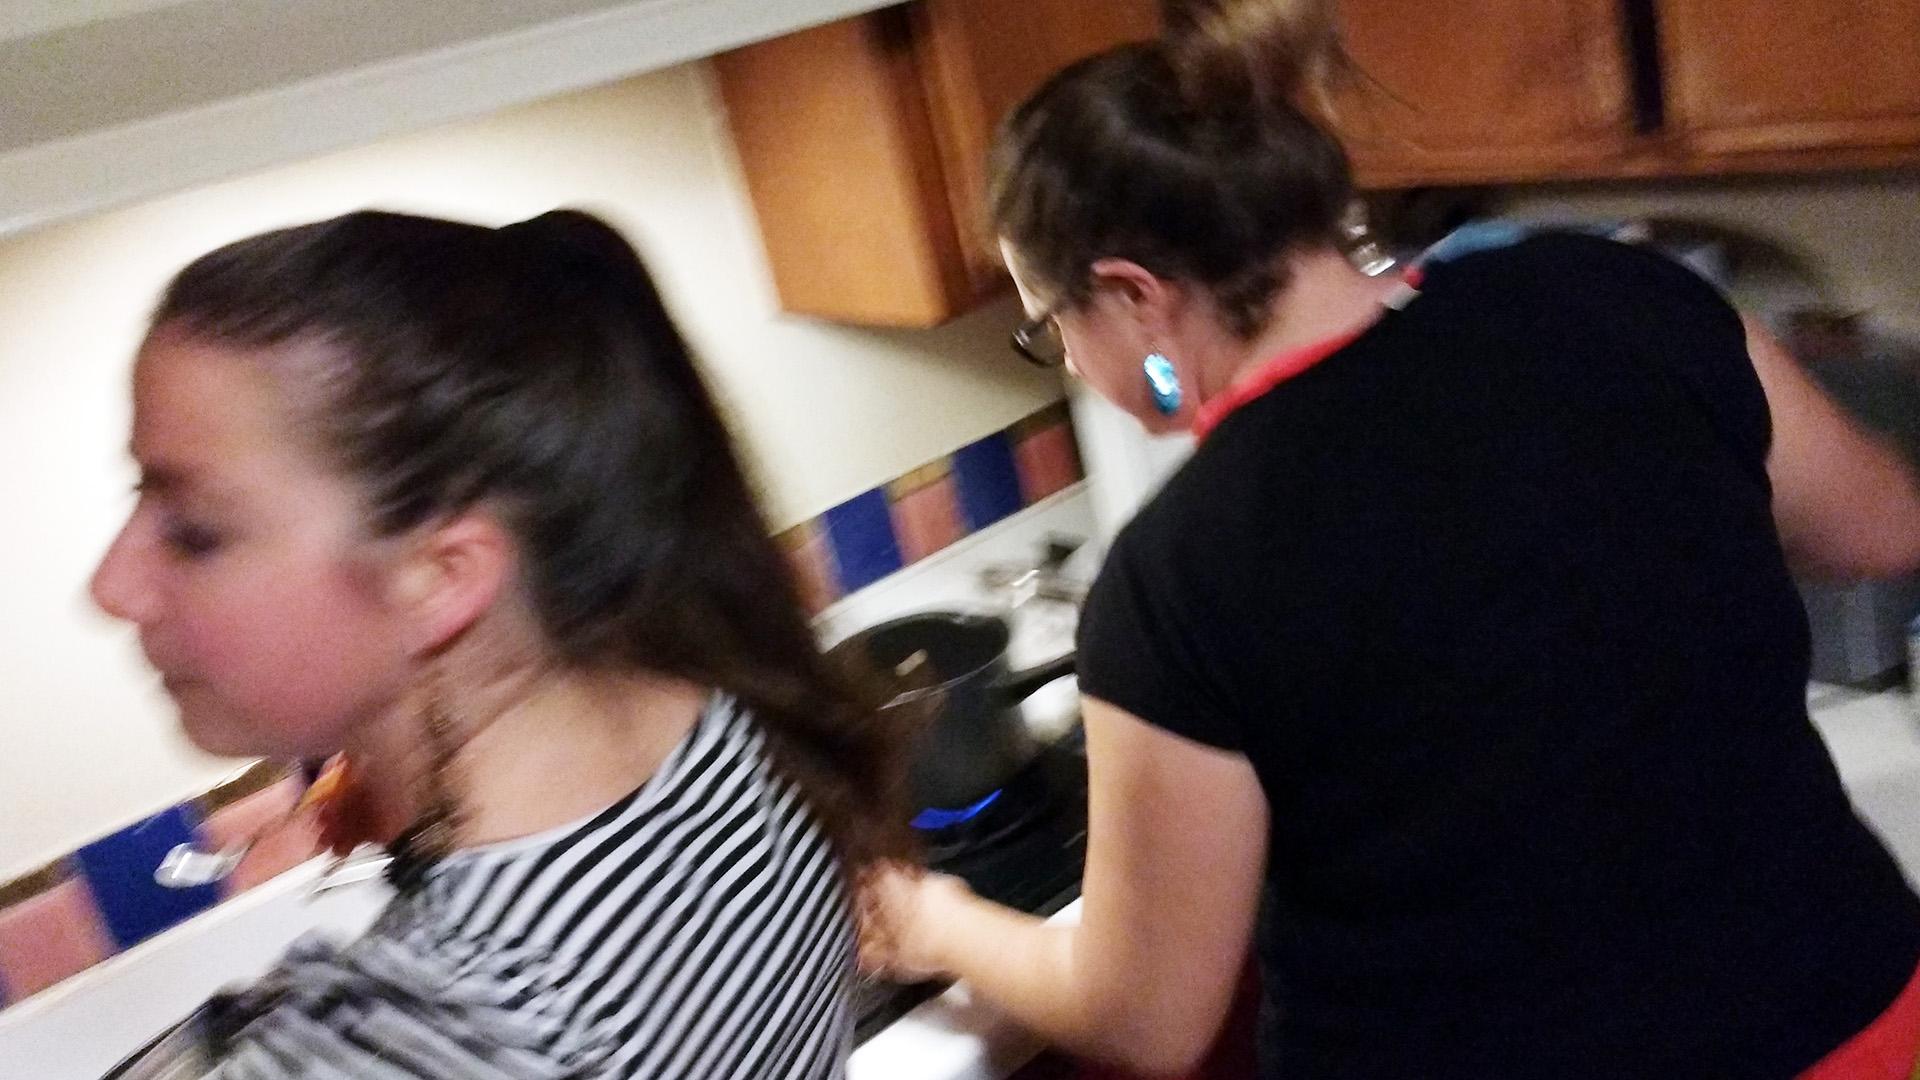 Terézia & Cecile working over the stove